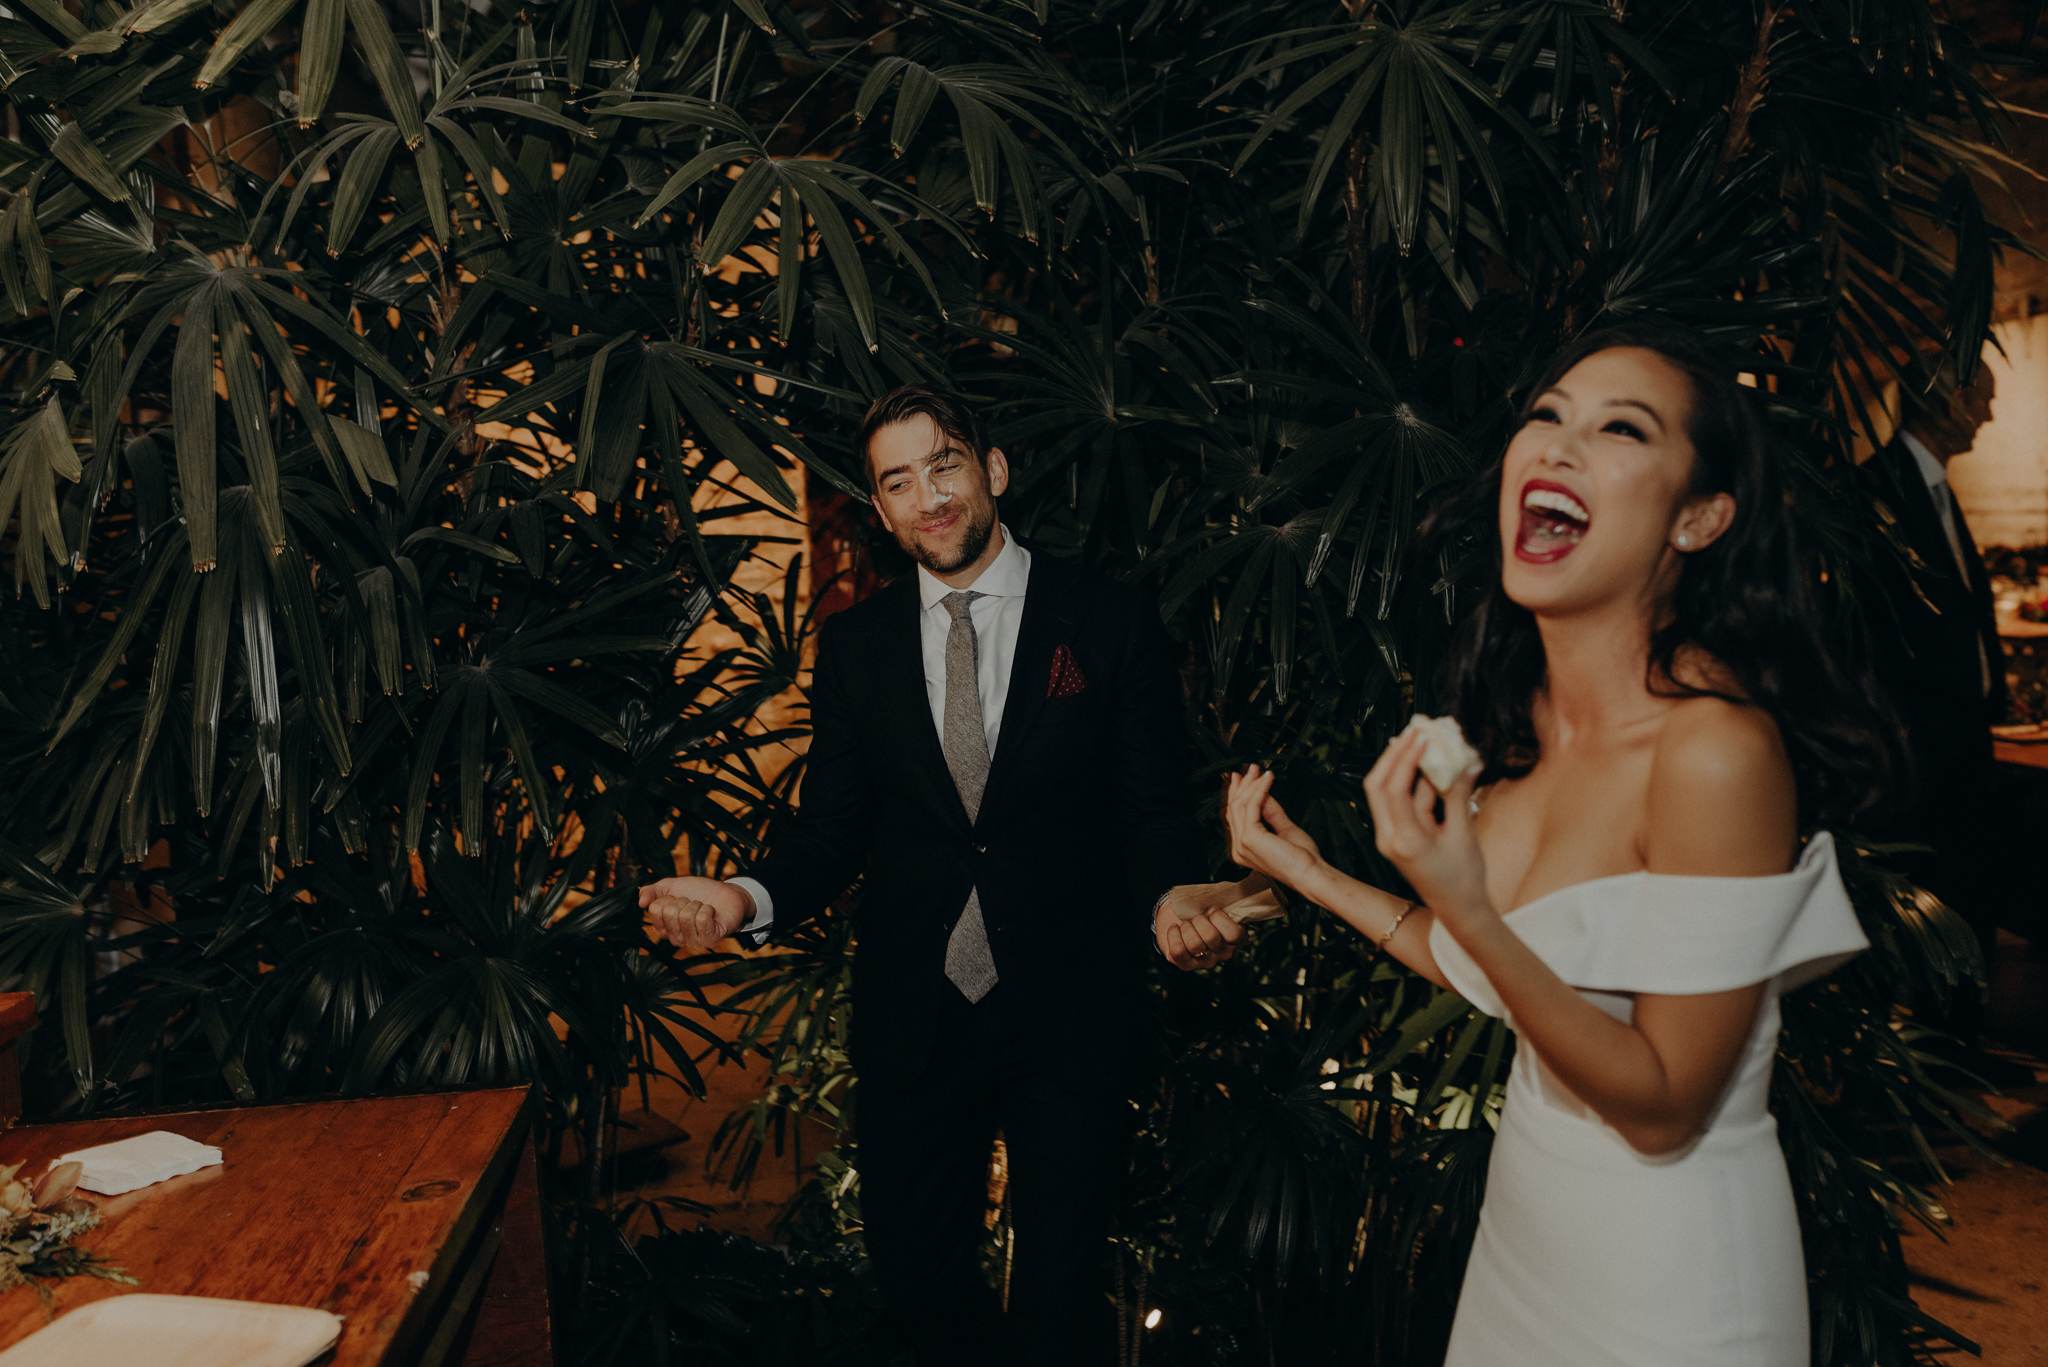 Wedding Photo LA - wedding photographer in los angeles - millwick wedding venue -isaiahandtaylor.com-134.jpg